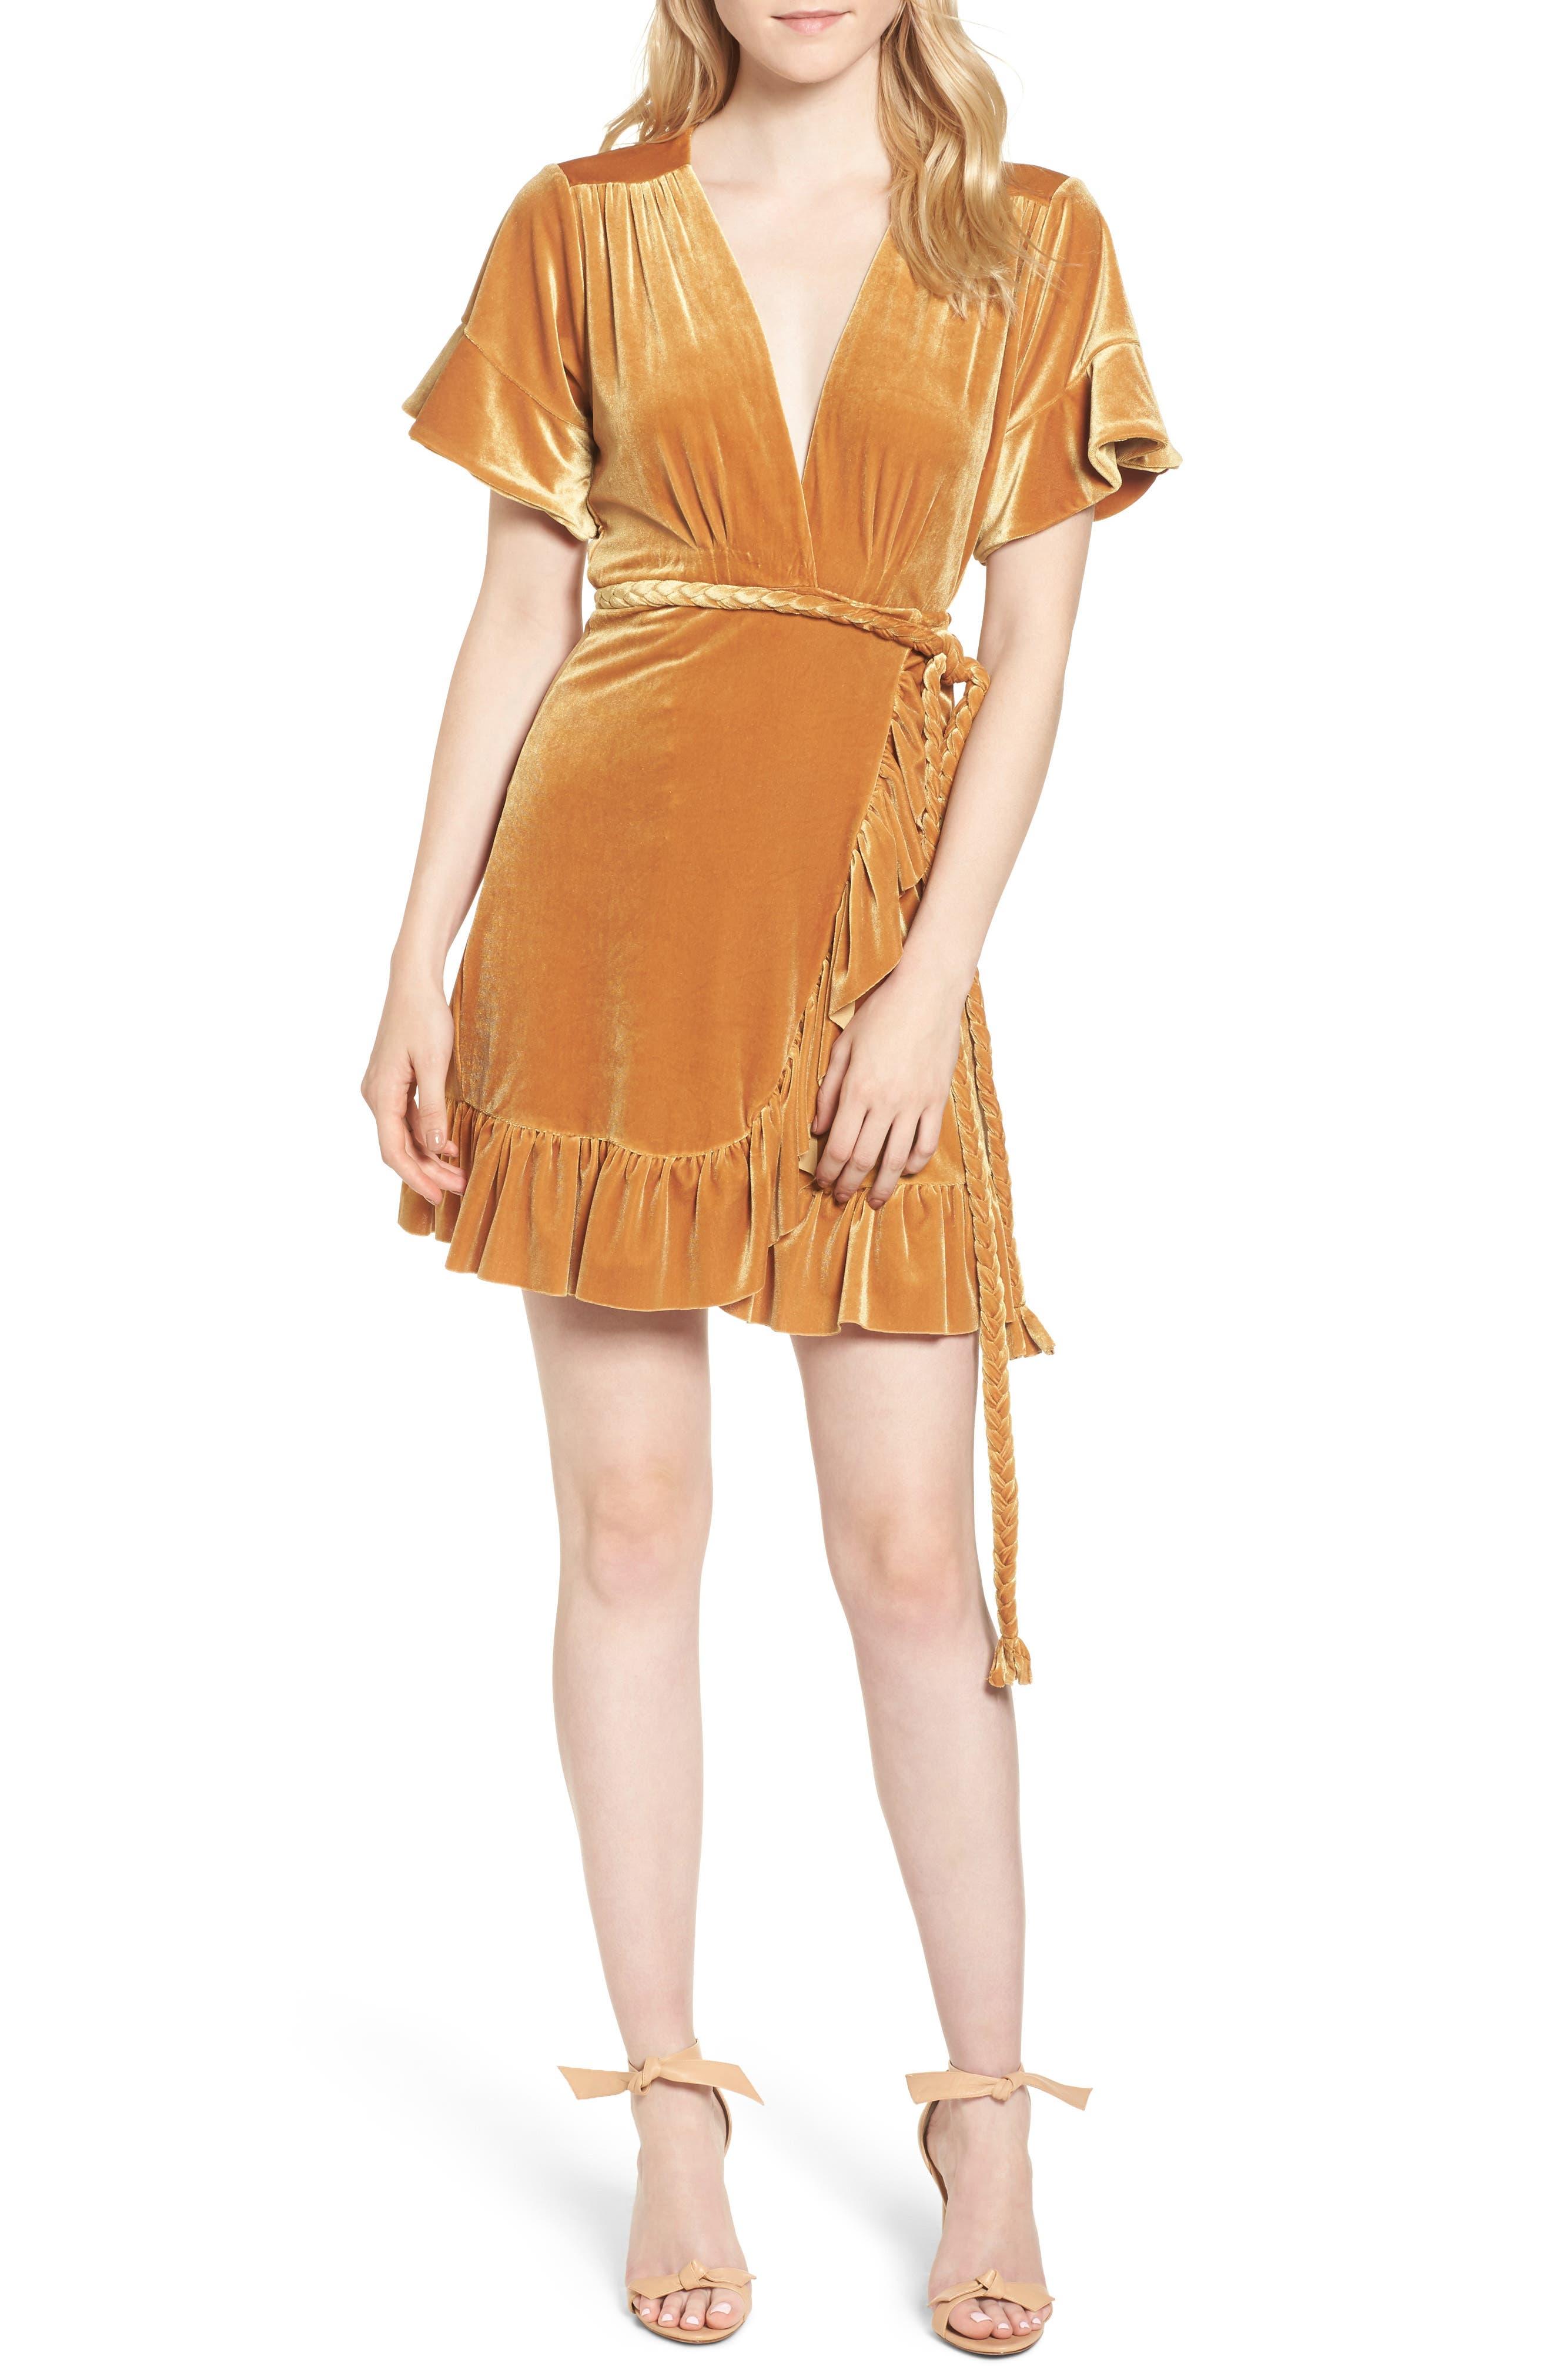 Desma Velvet Wrap Minidress,                         Main,                         color, Gold